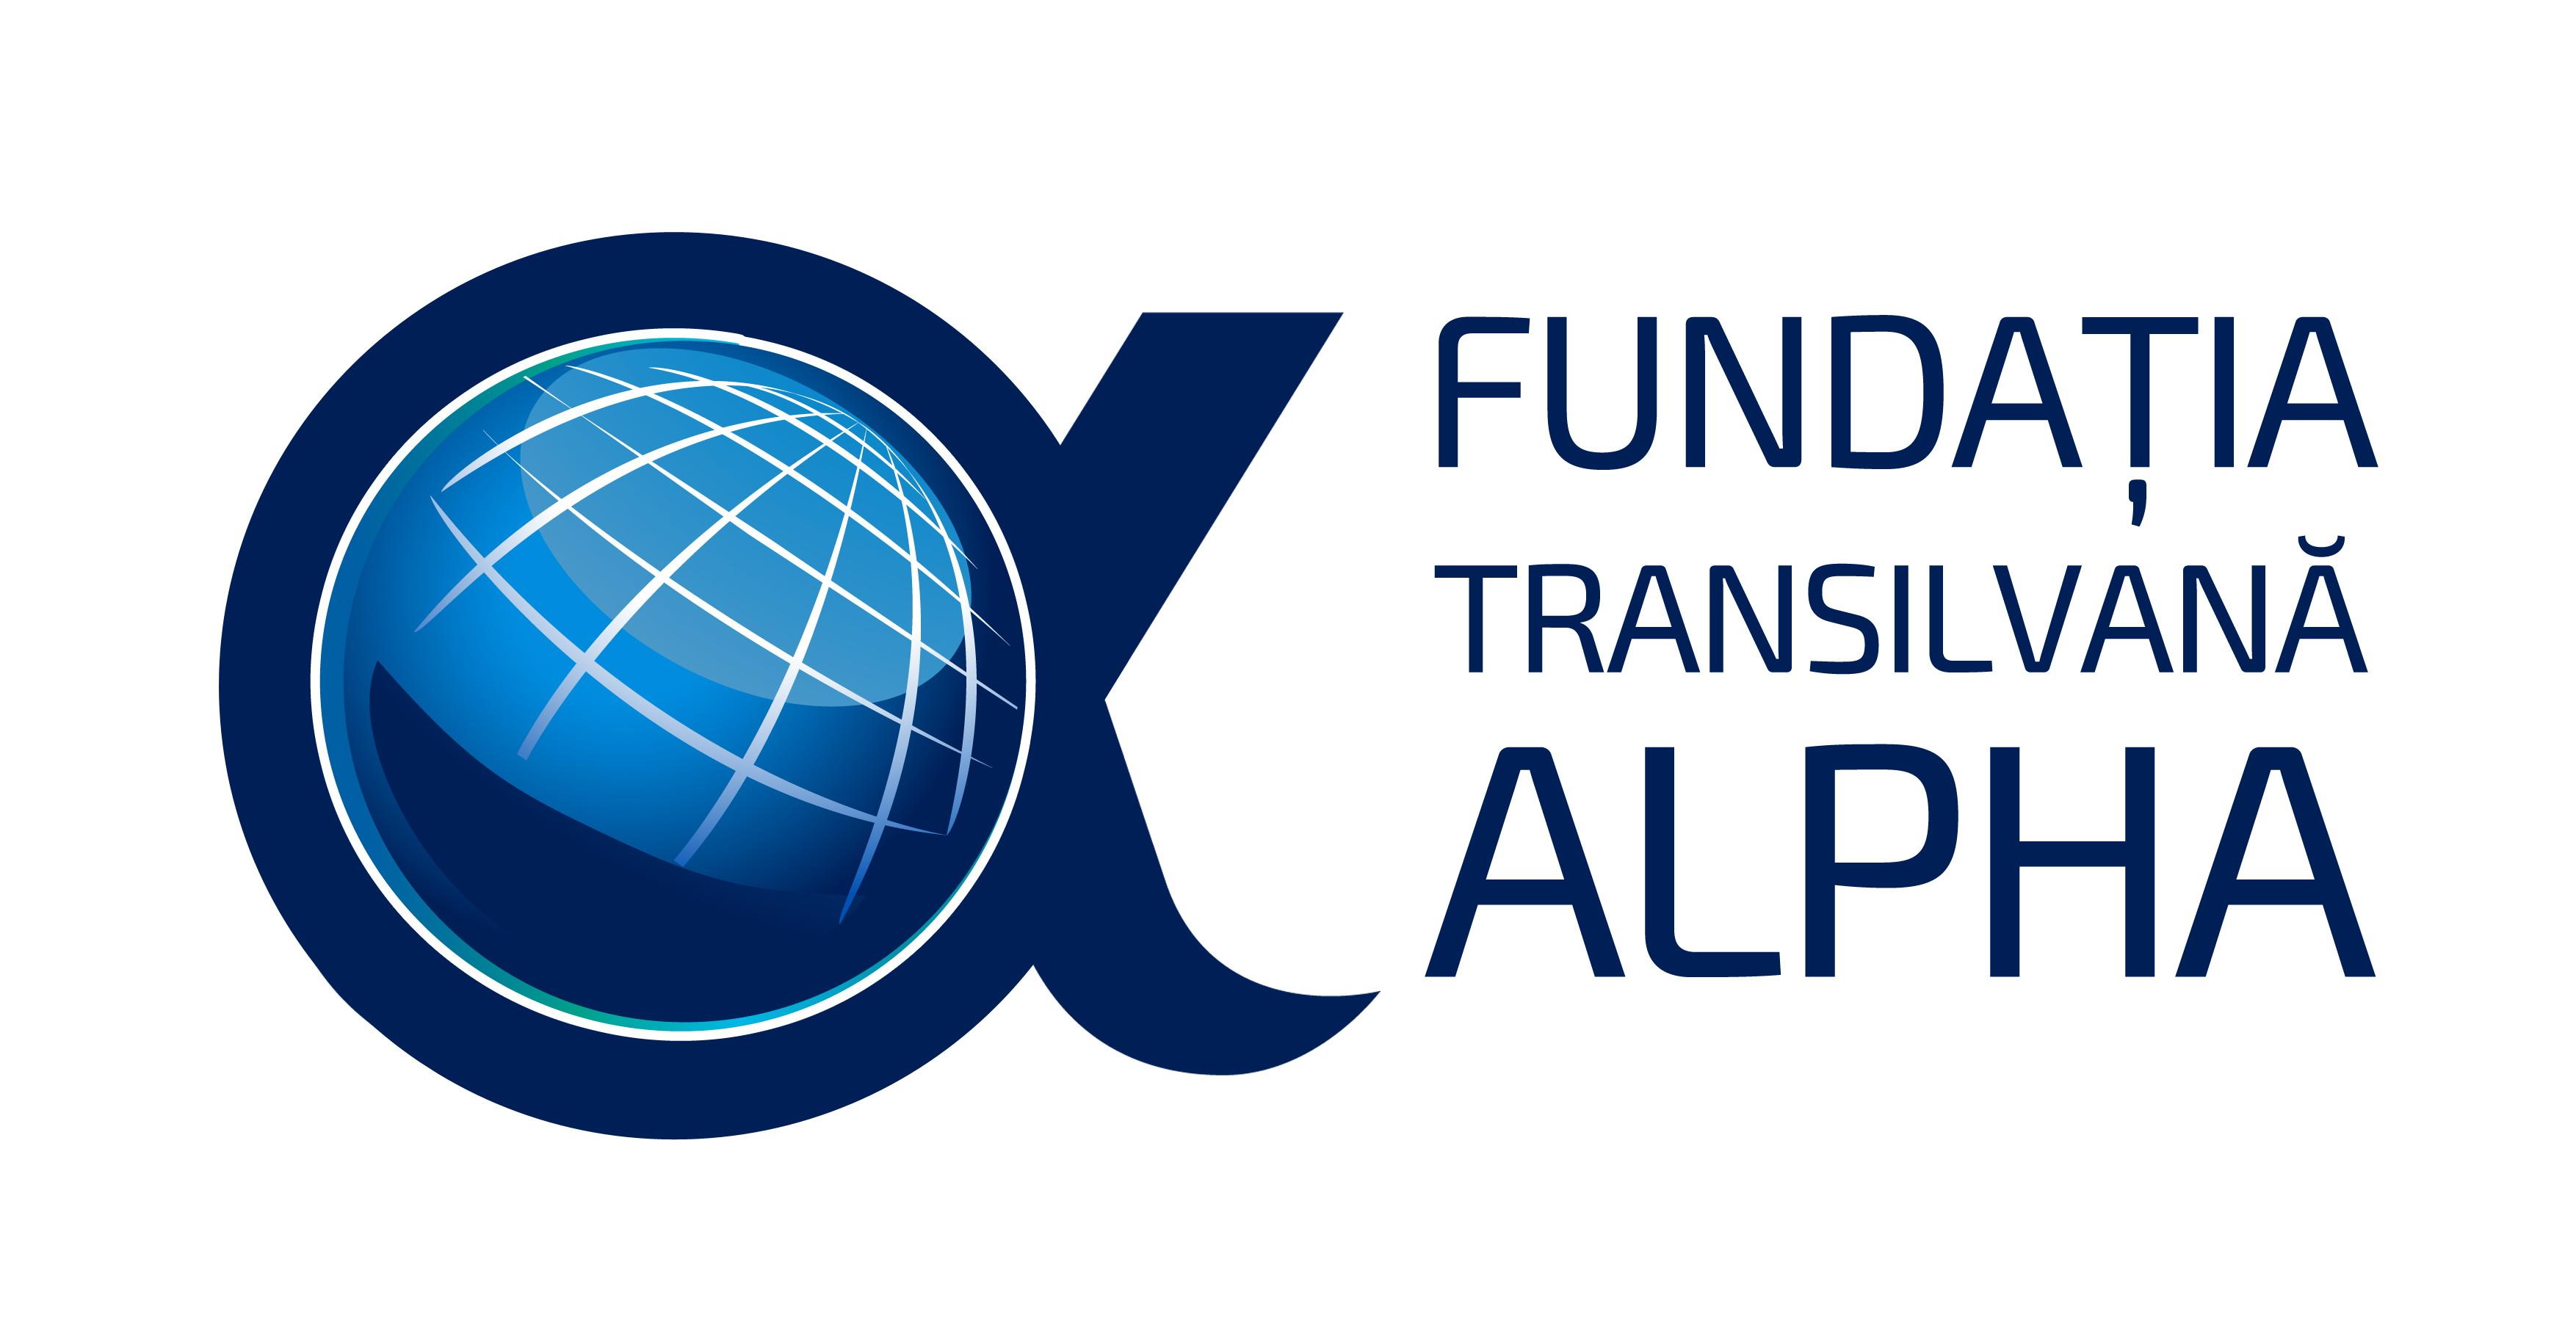 Fundatia Transilvana Alpha logo